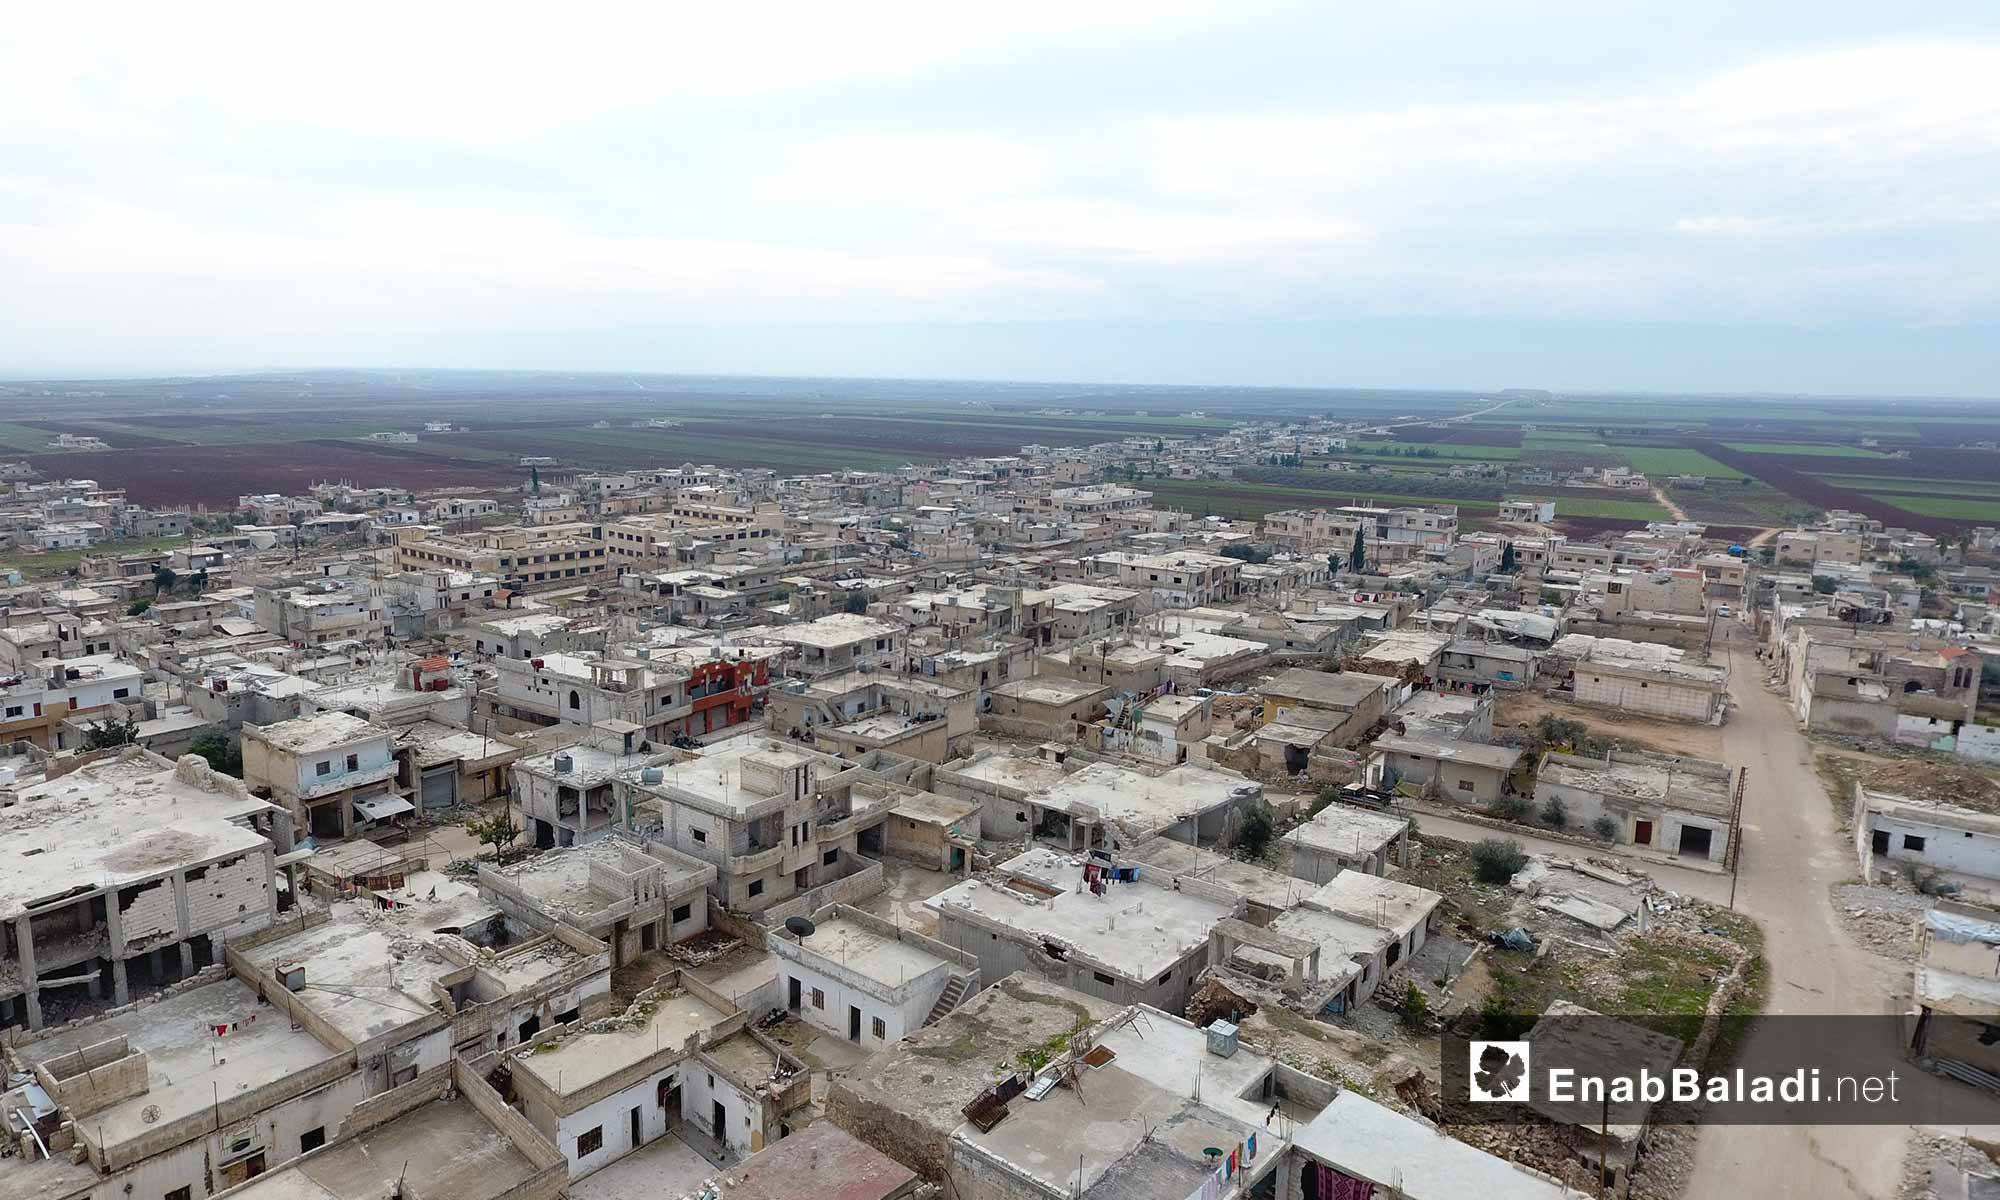 Drone photo of the Kafr Nabudah town, northern rural Hama—18 August 2017 (Enab Baladi)